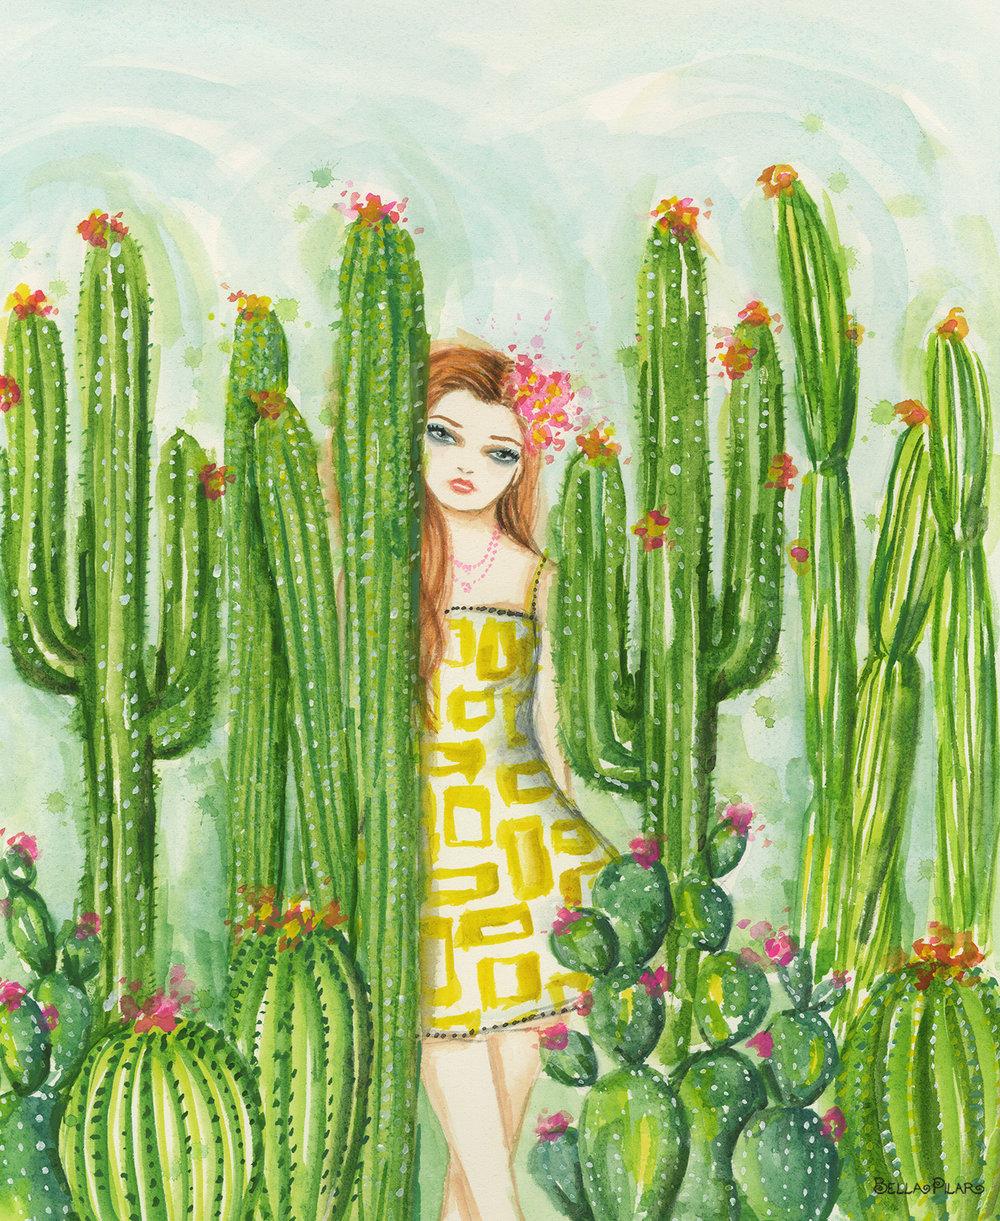 Caitlin in the cactus garden